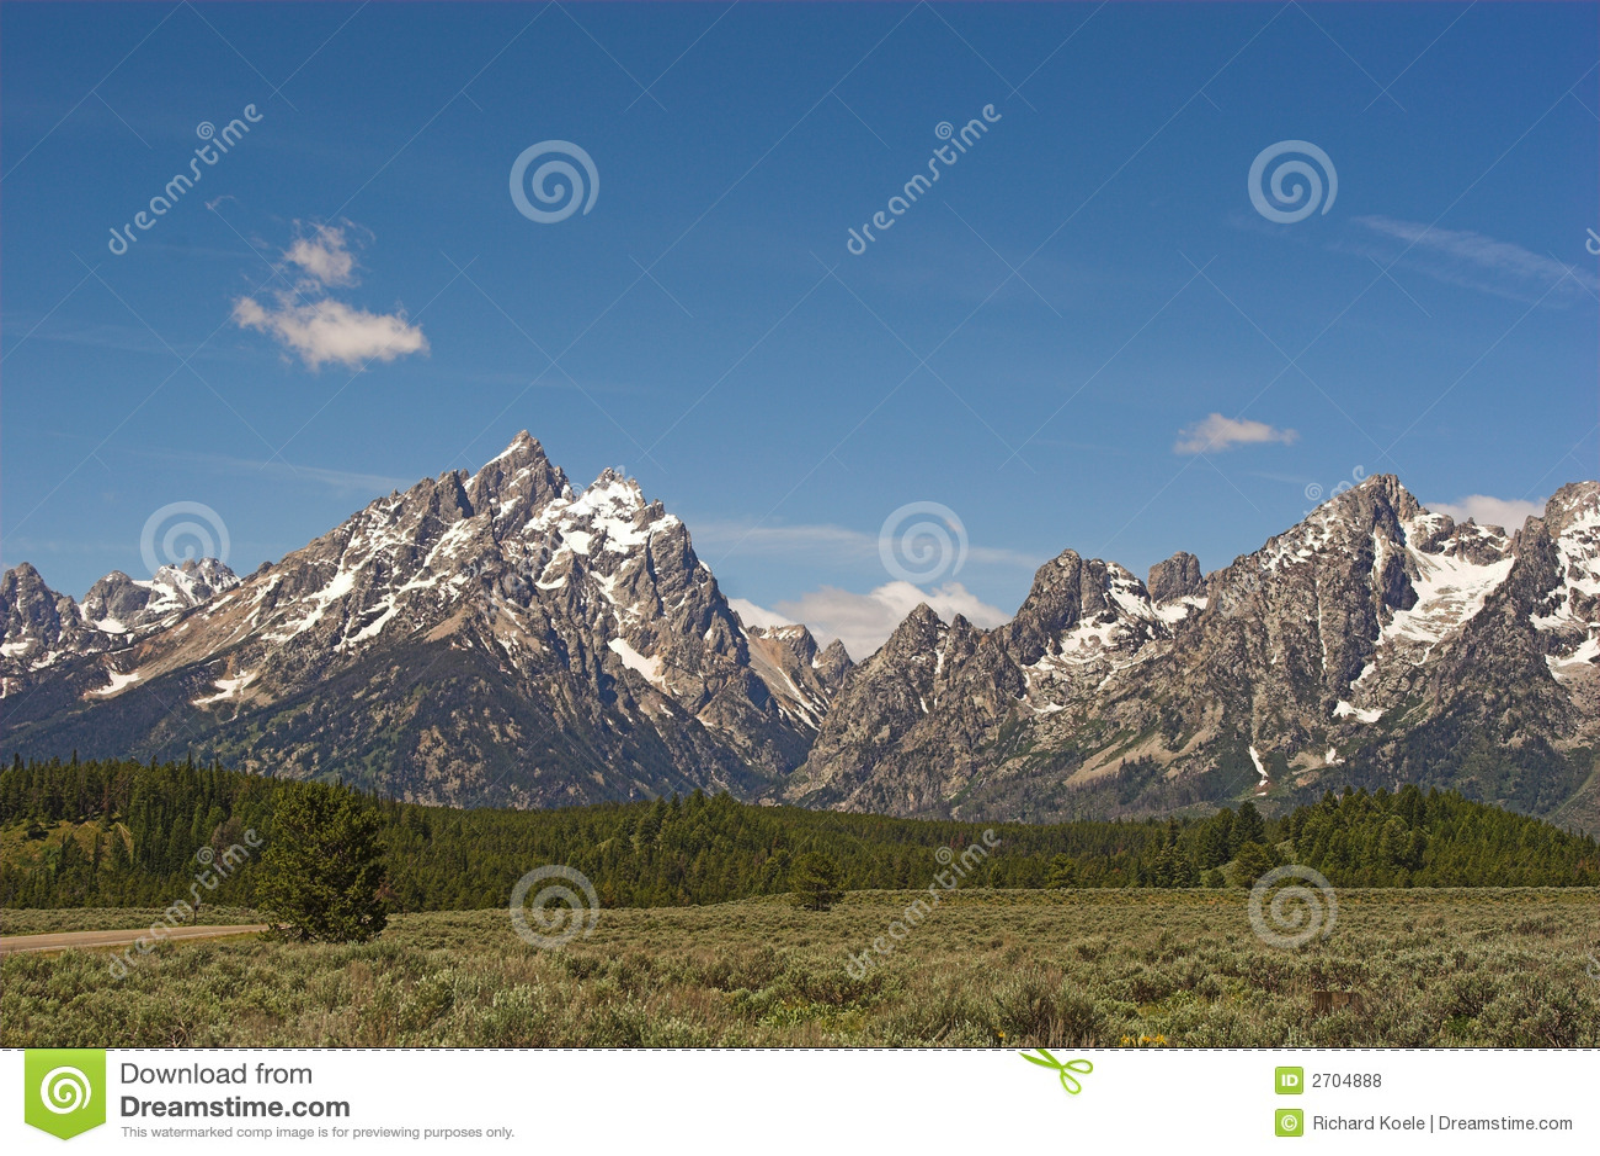 Mountain Majesty Royalty Free Stock Photos Image 2704888